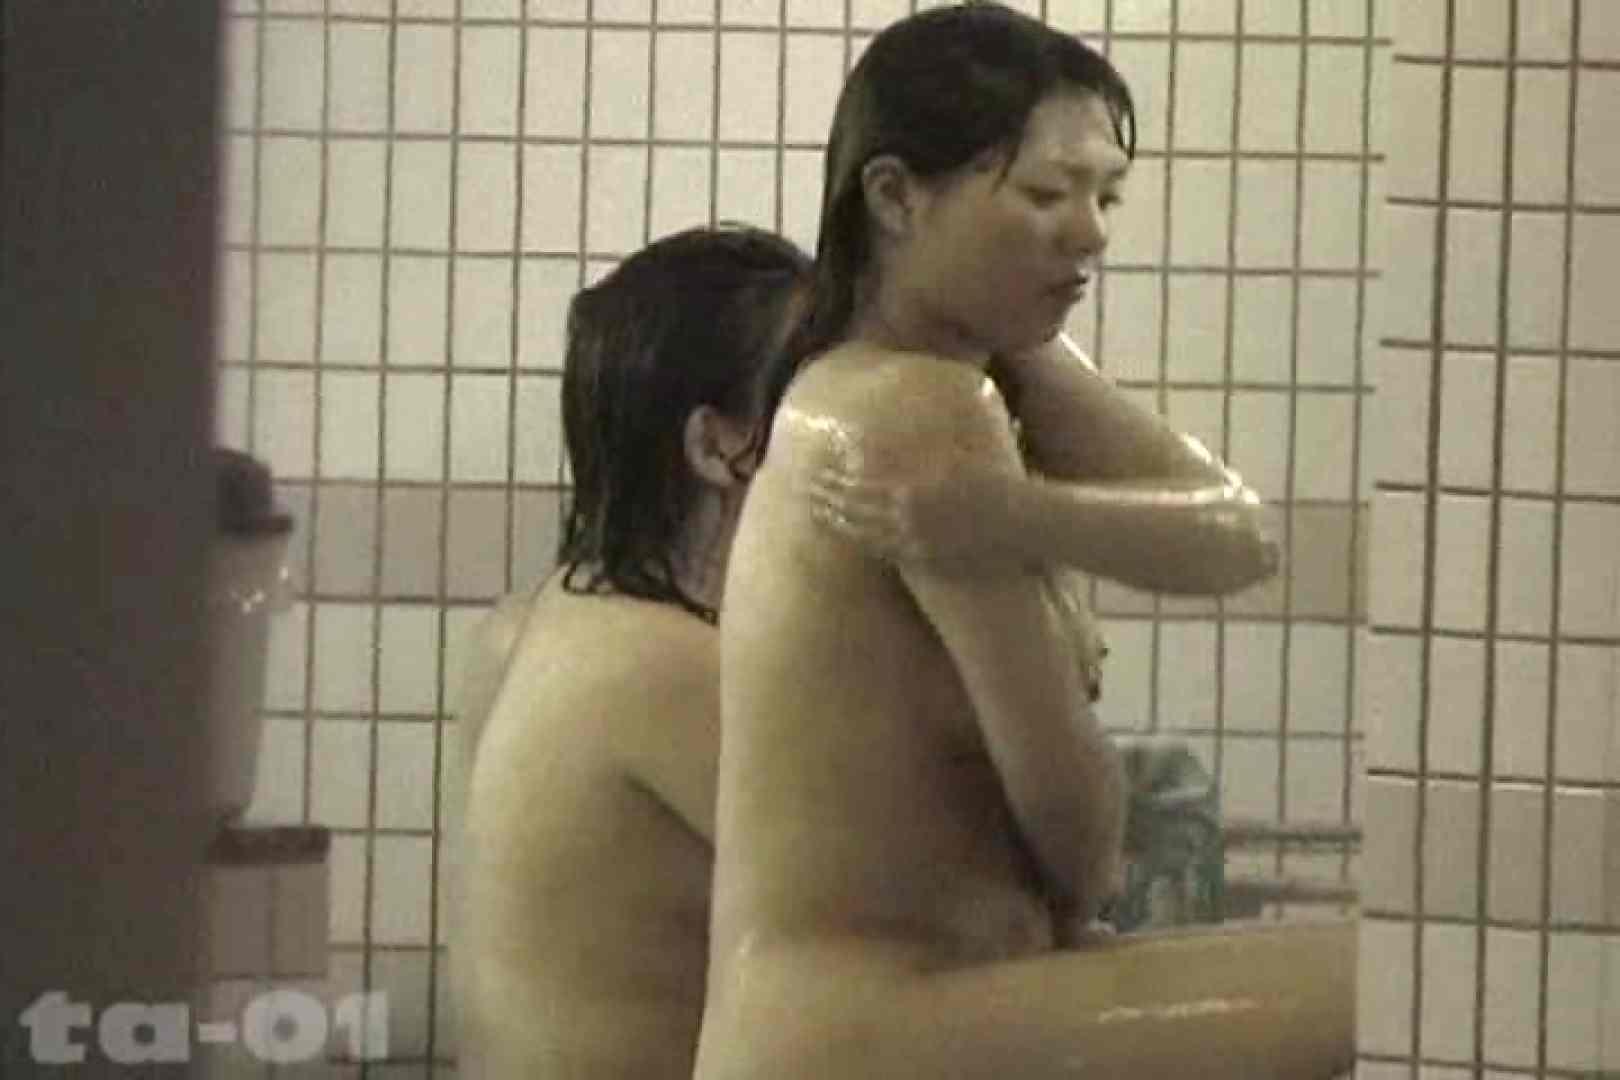 合宿ホテル女風呂盗撮高画質版 Vol.01 高画質 濡れ場動画紹介 53連発 34